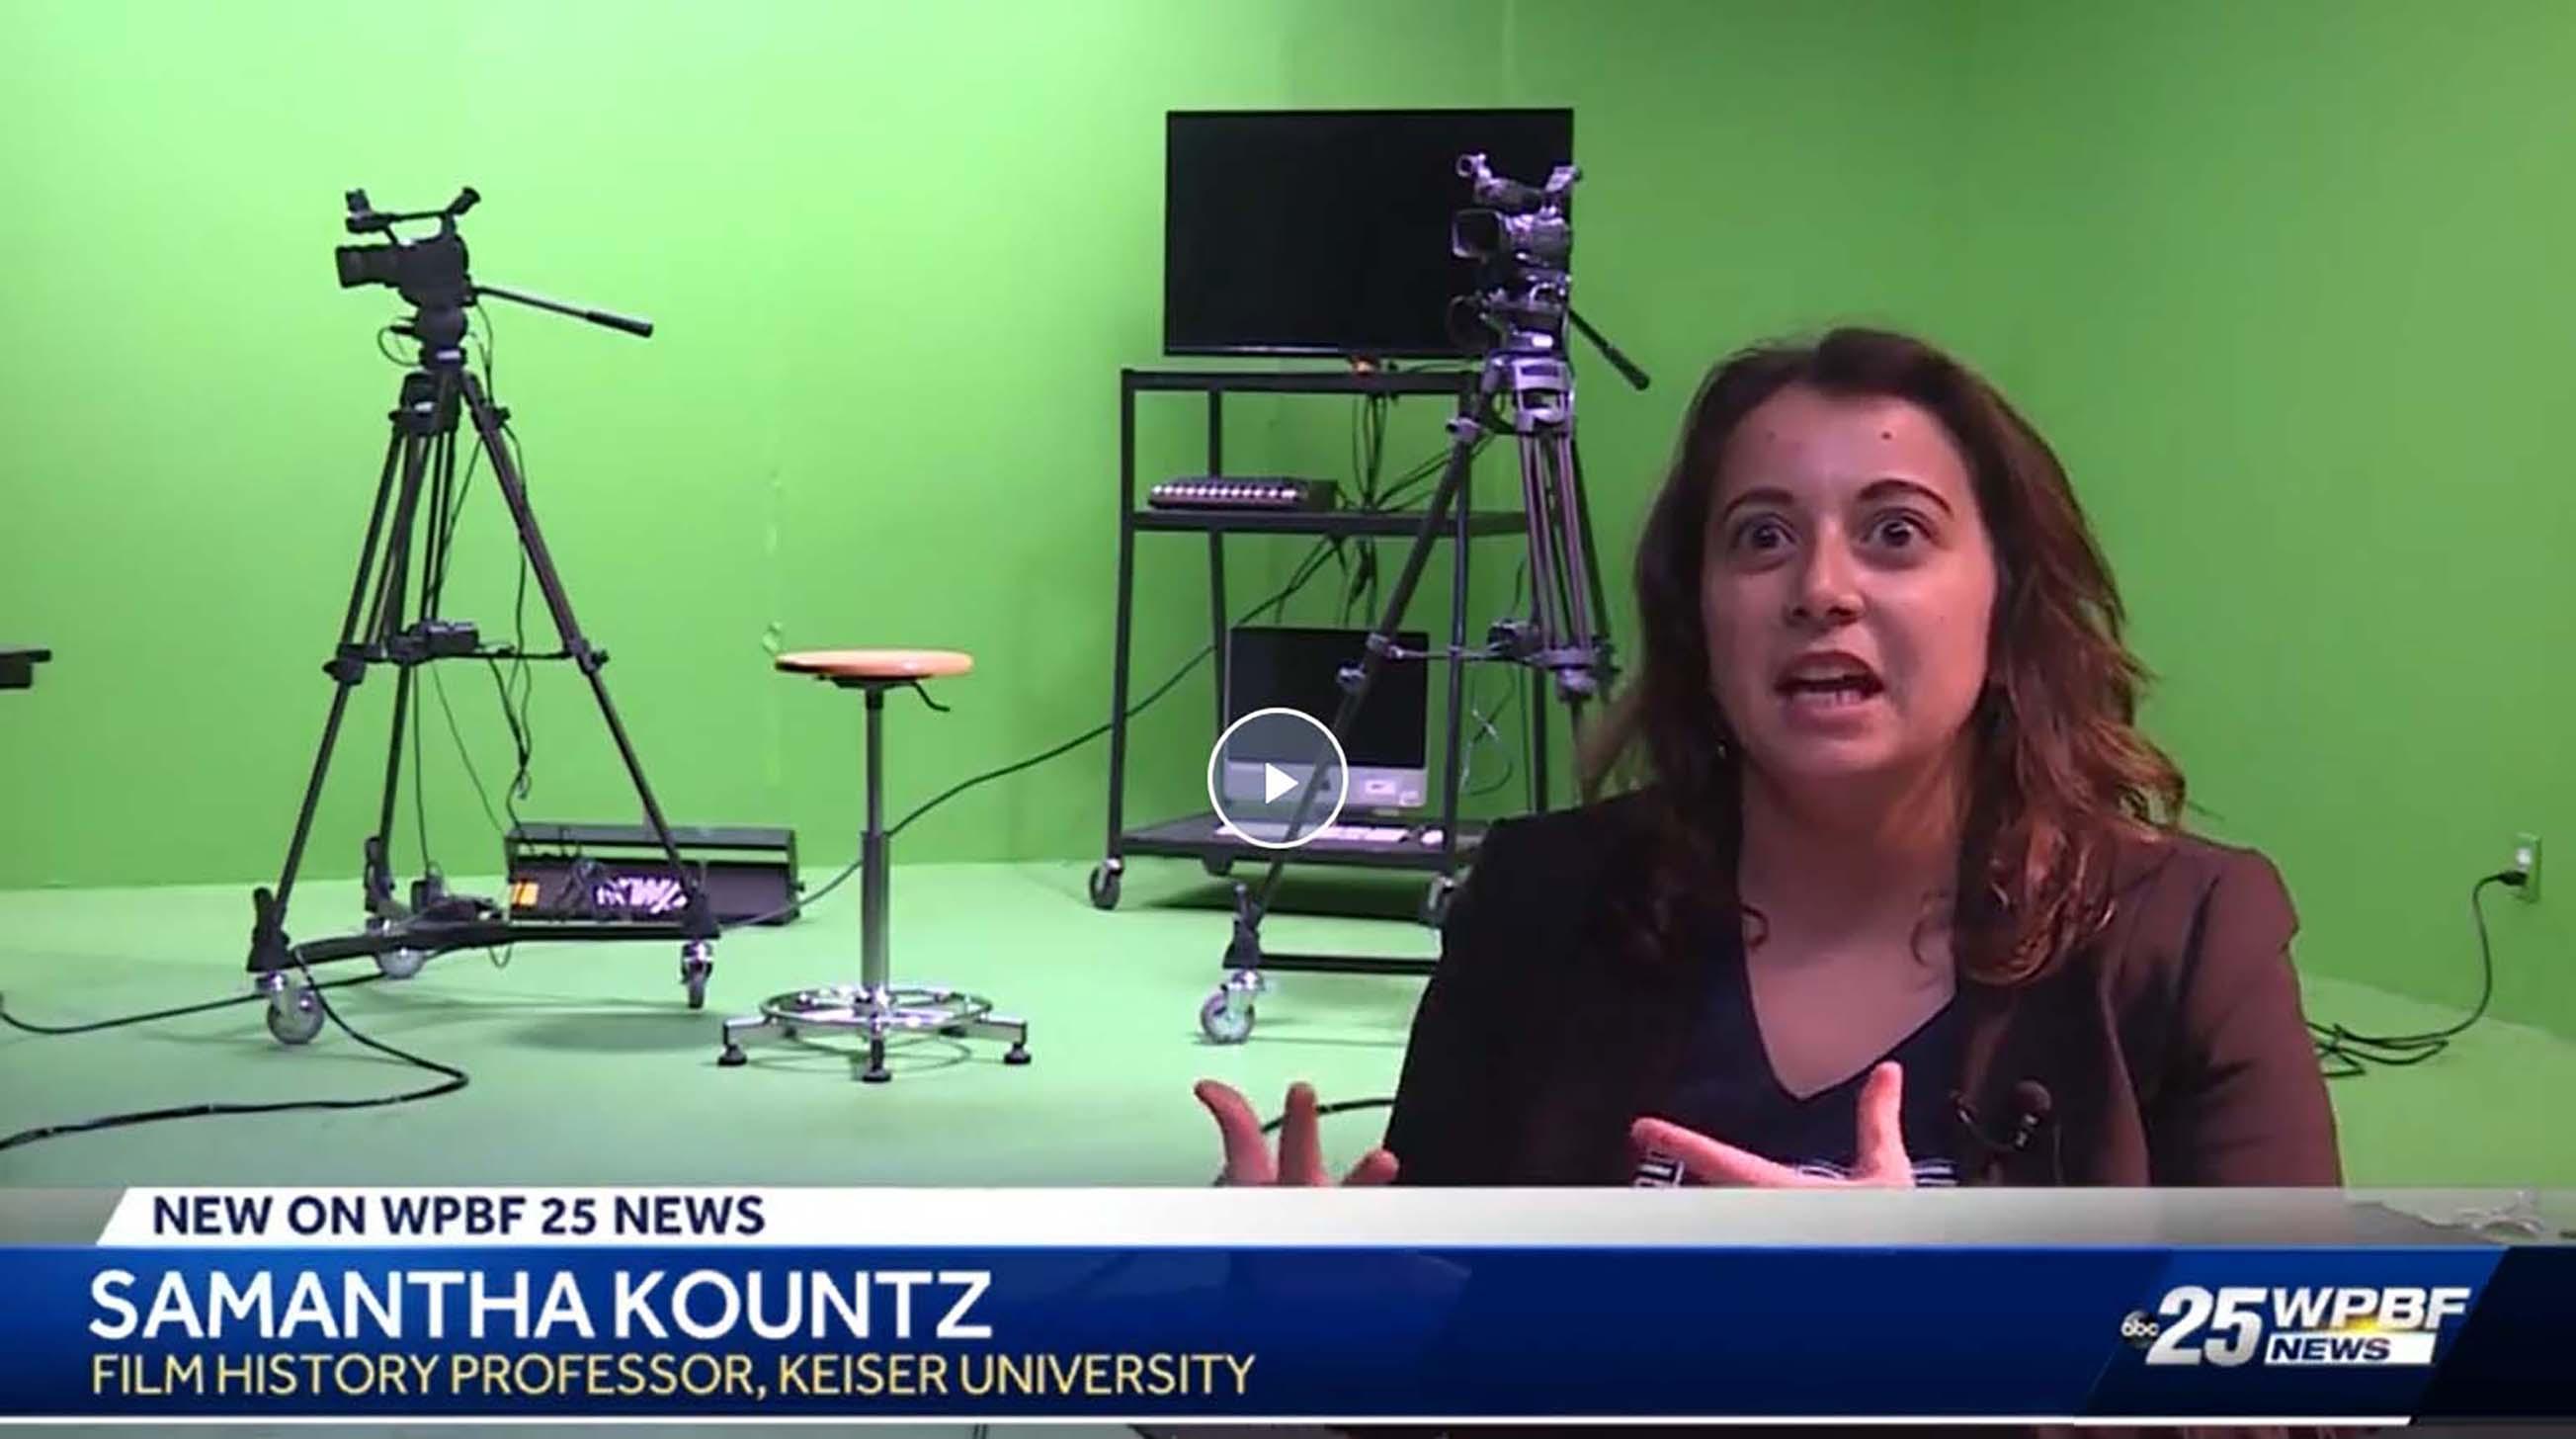 Keiser University Melbourne Halloween 2020 Keiser University and GStar Film Instructor Shares Top Ingredients